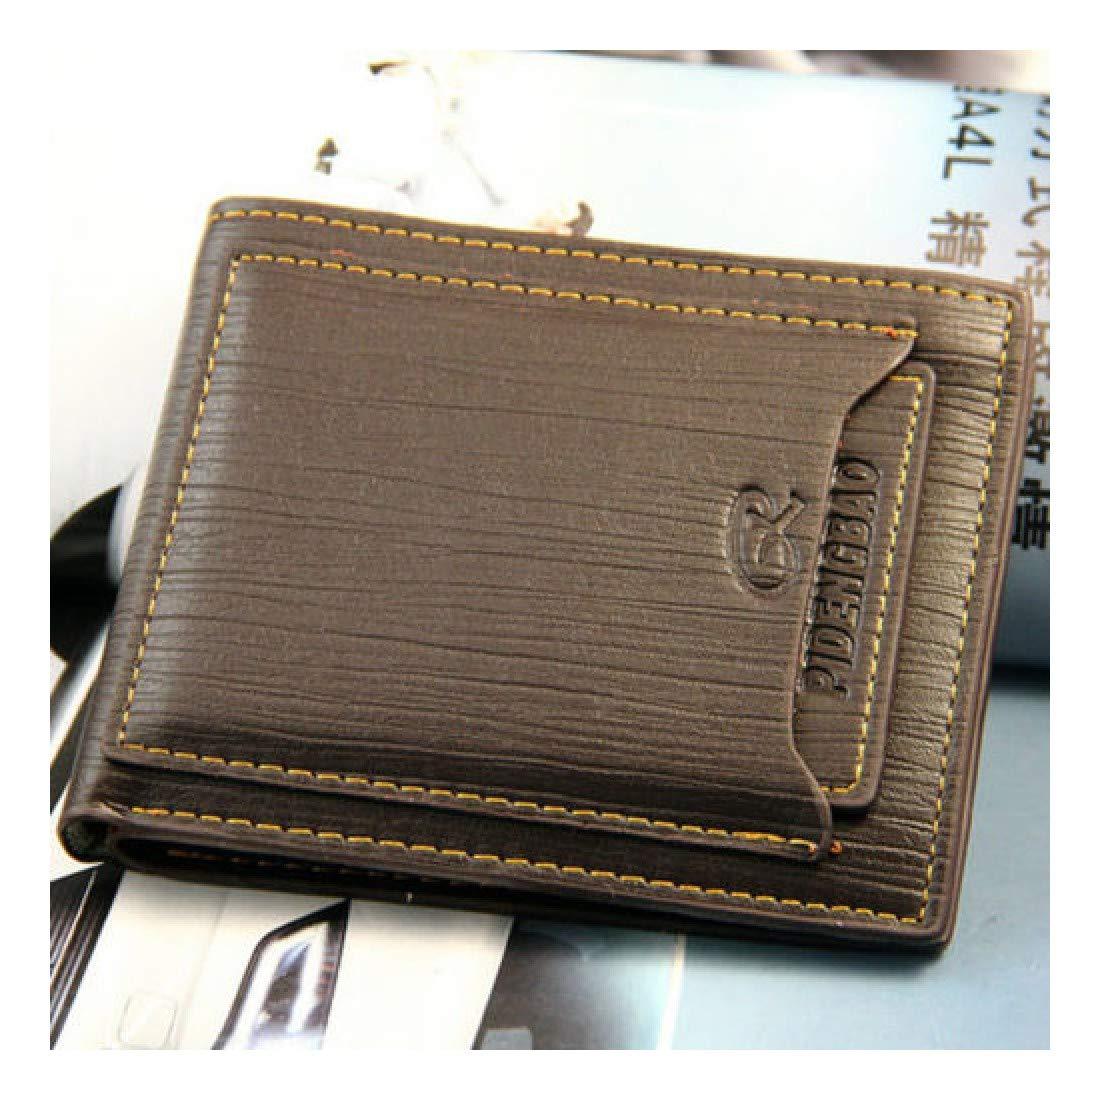 Mens Bifold Leather ID Credit Card Holder Pocket Money Purse Clutch Wallet